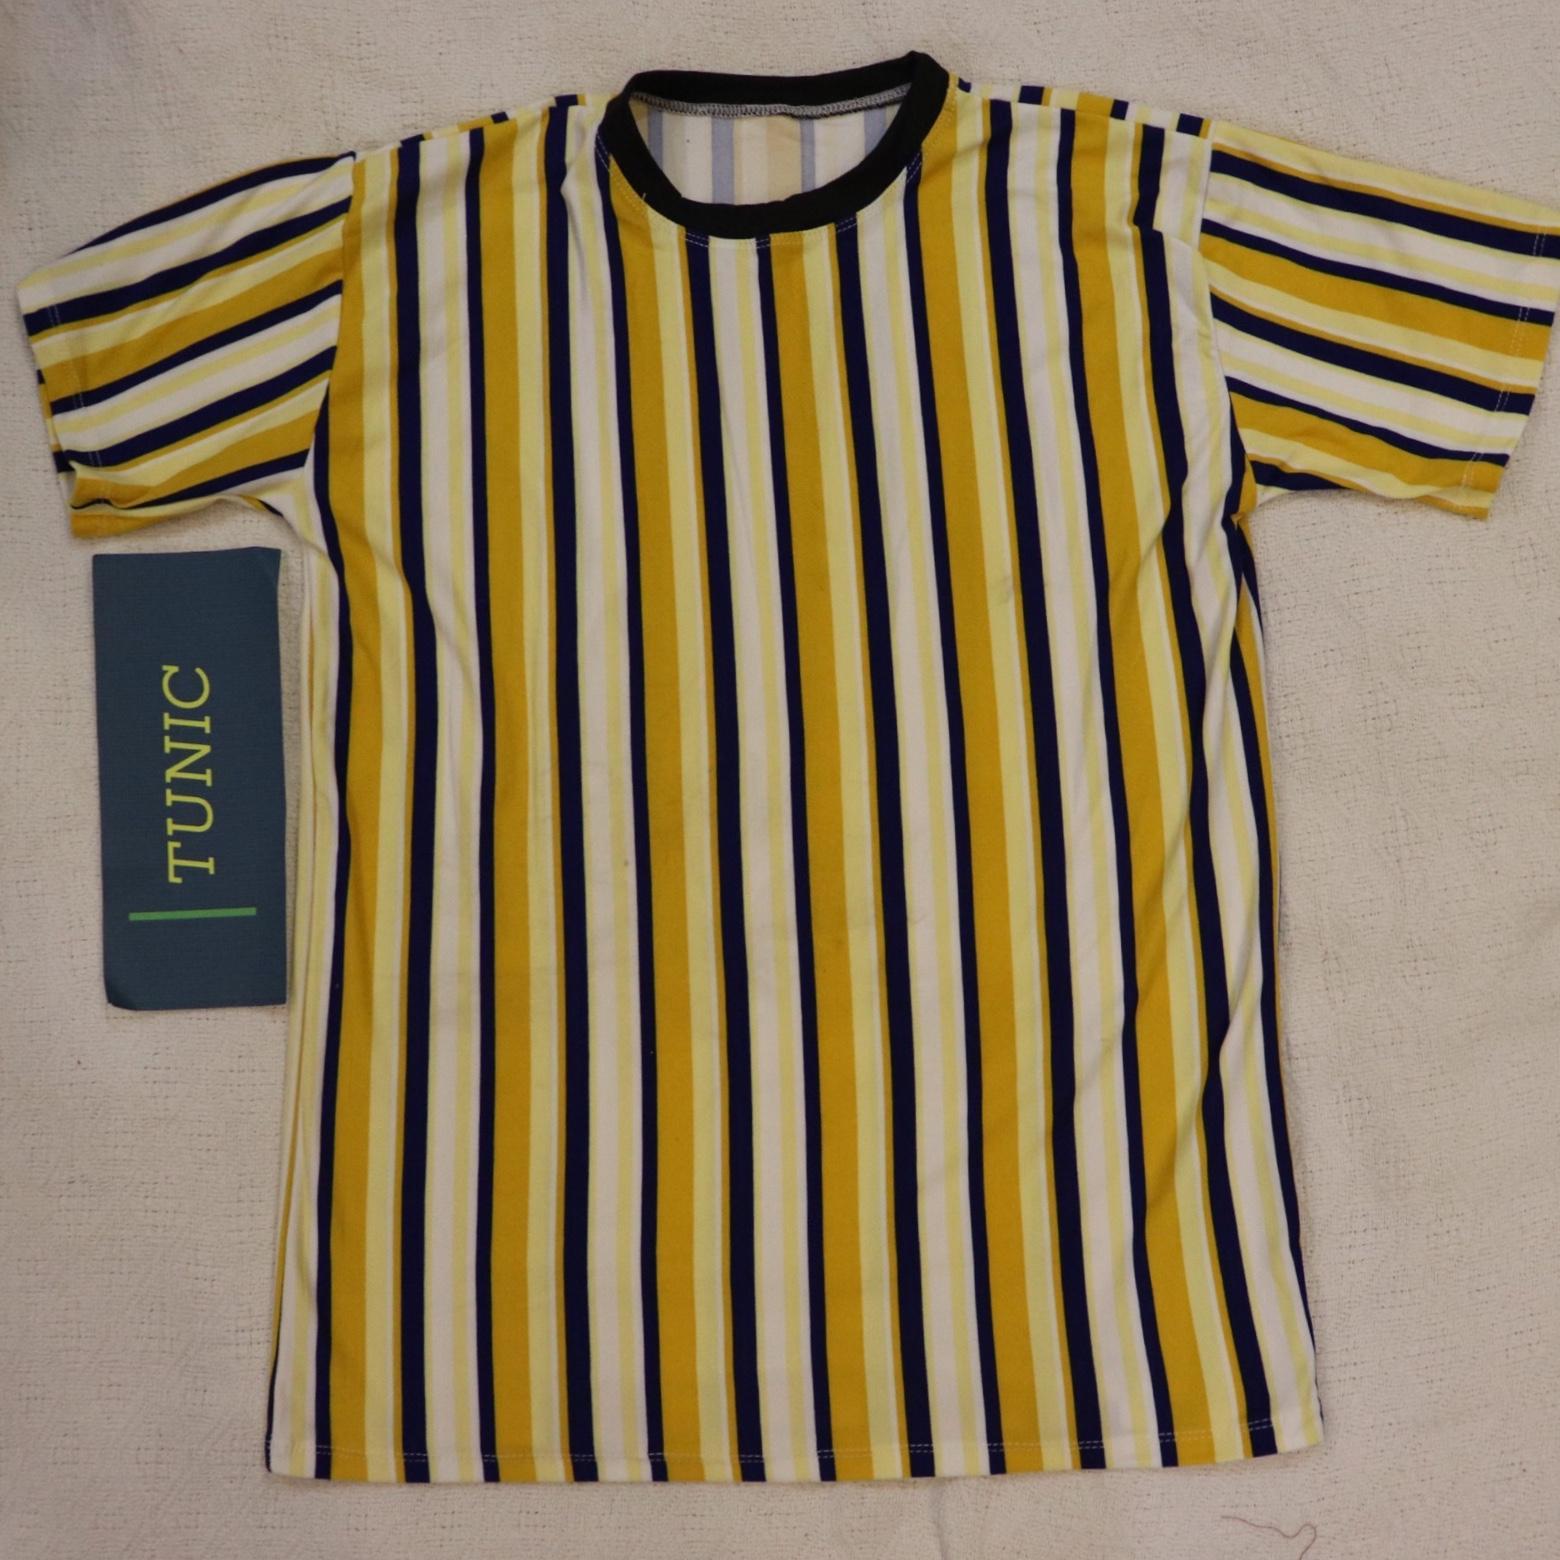 cf545371cf1 Men Shirt Crew T-Shirt Casual Shirt Different Stripes Shirt Tees Plain  Colored T-